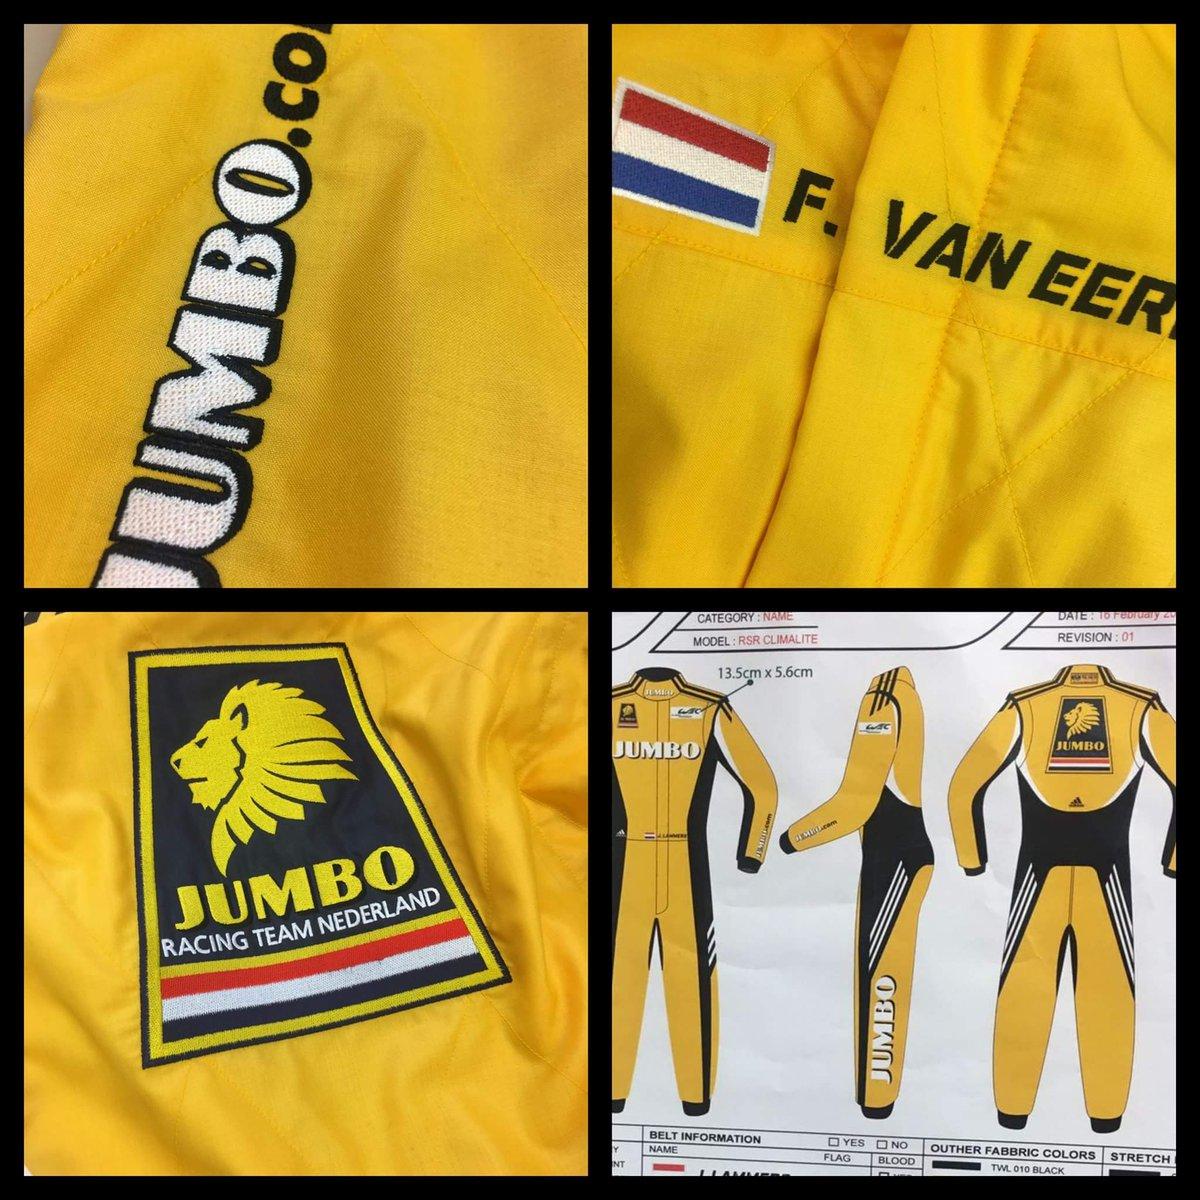 Brutal guitarra Marchito  Racing Team Nederland on Twitter: